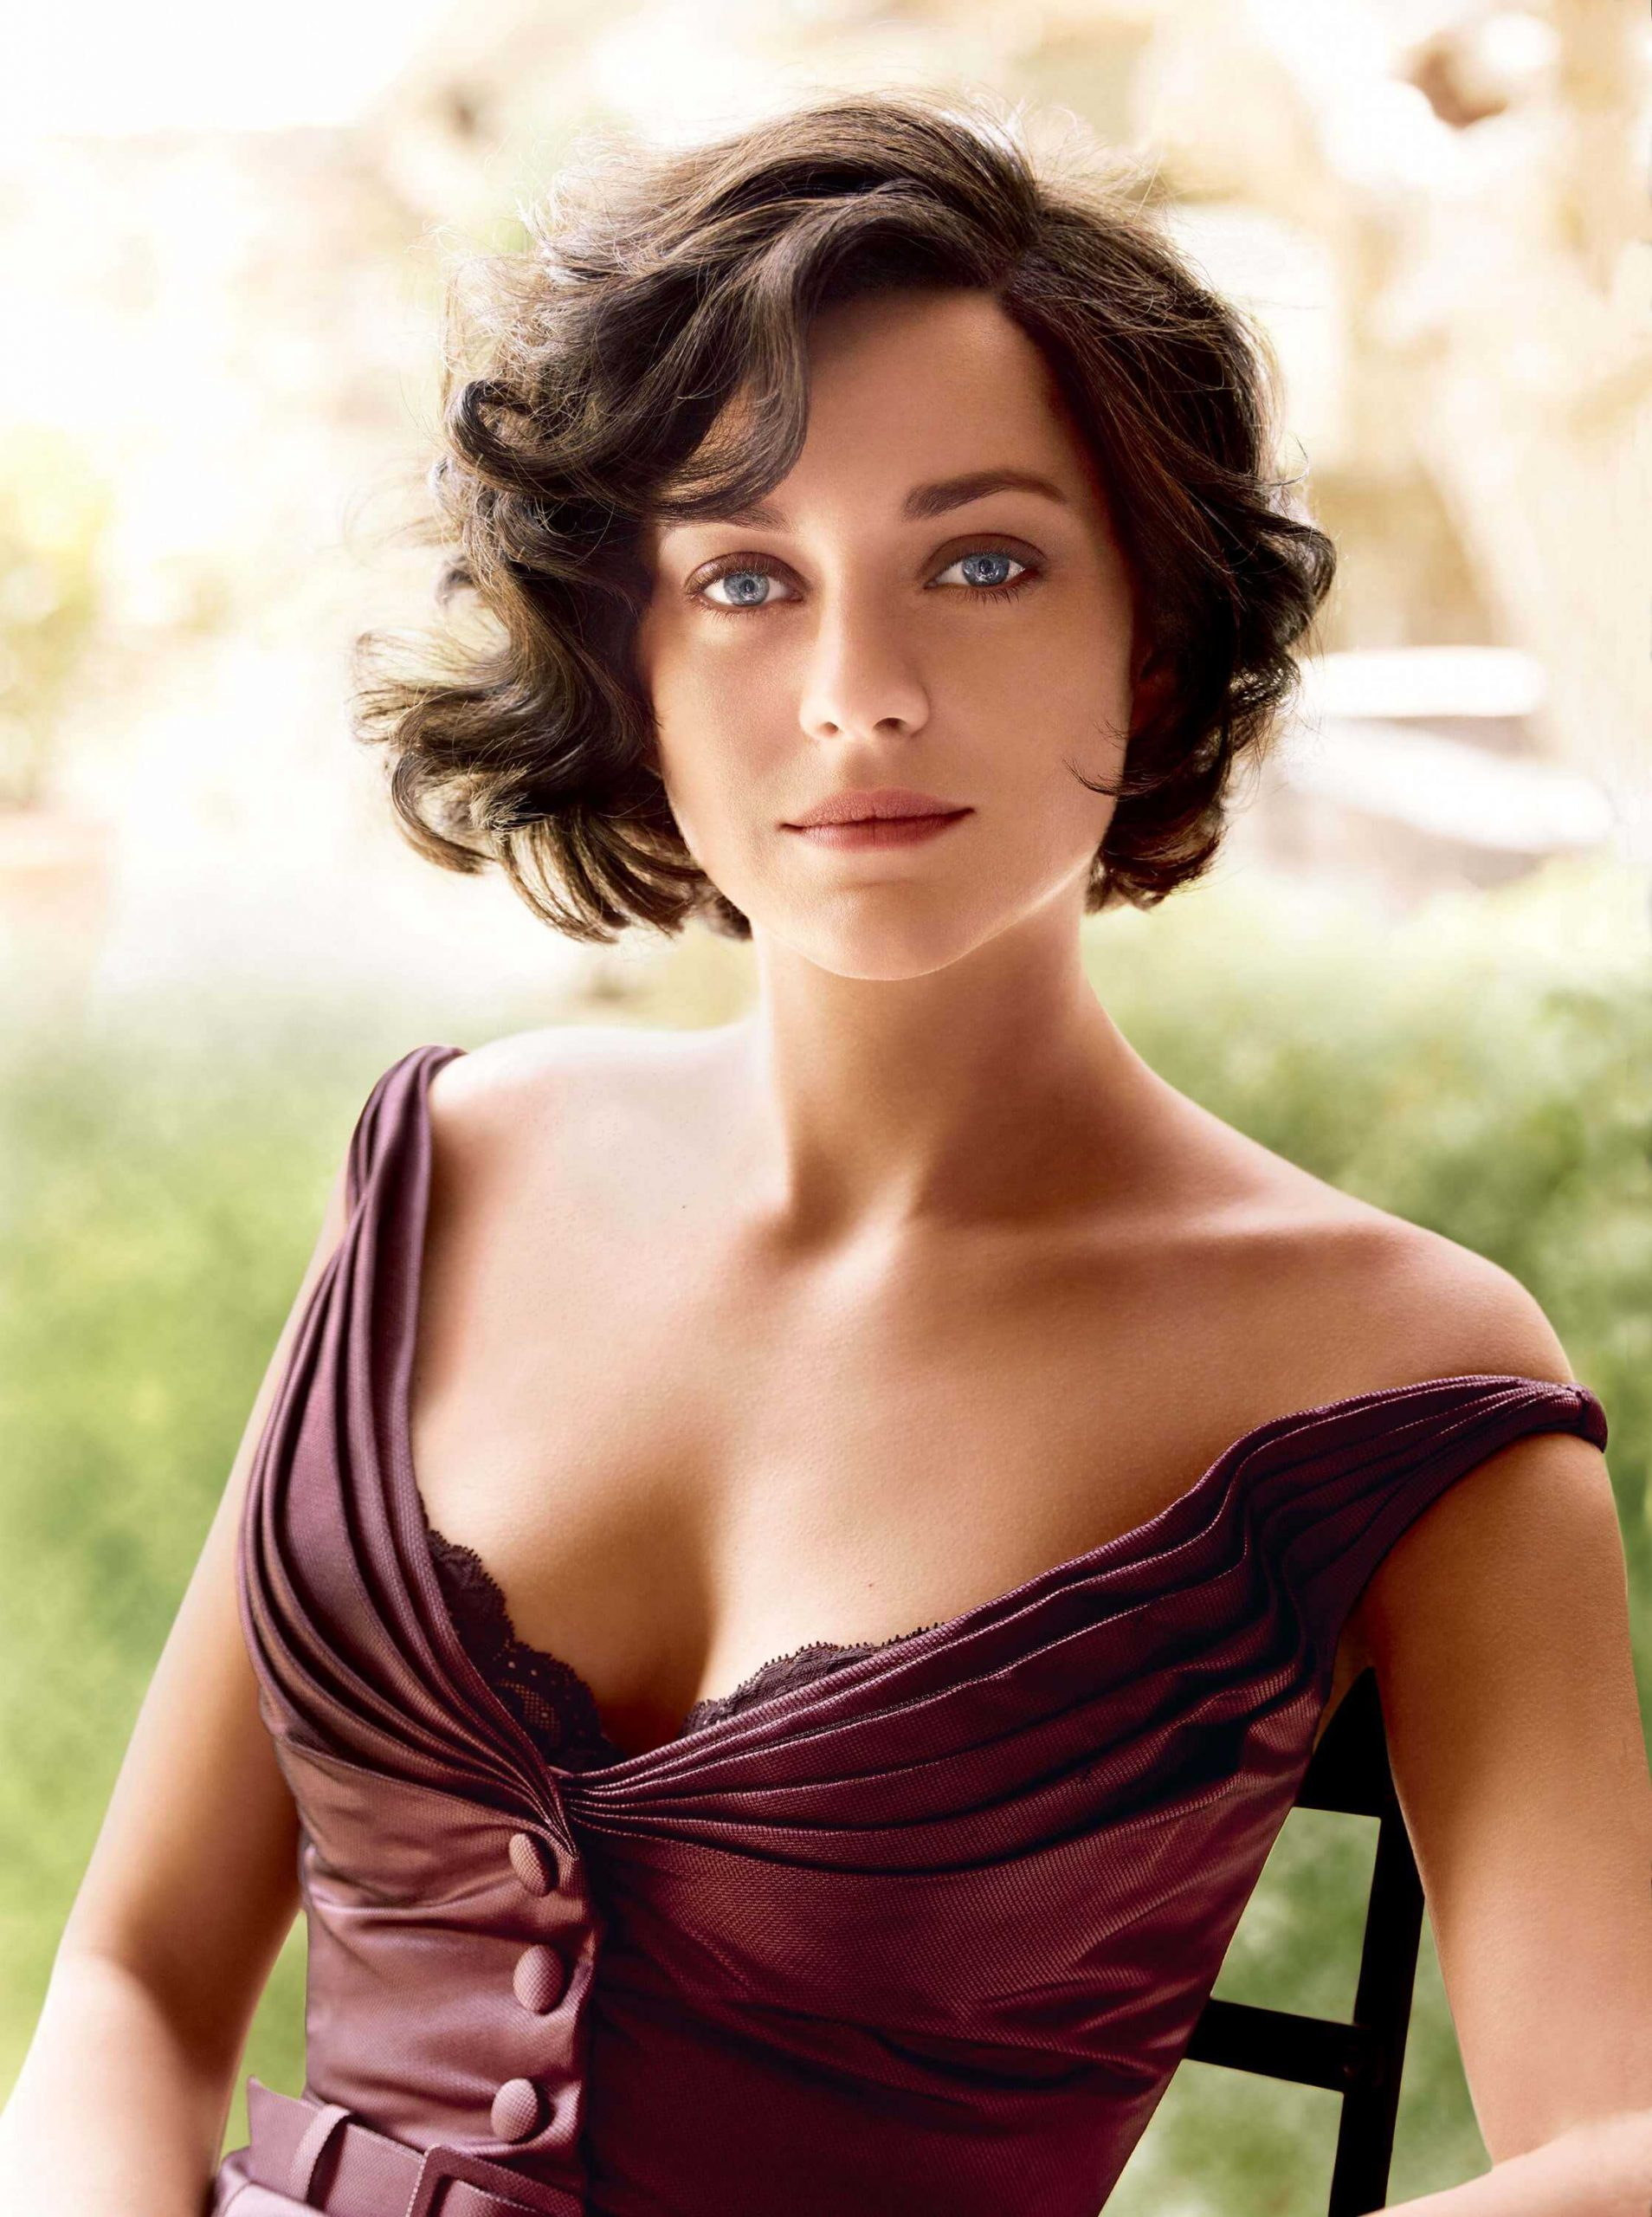 Marion Cotillard cleavage pics